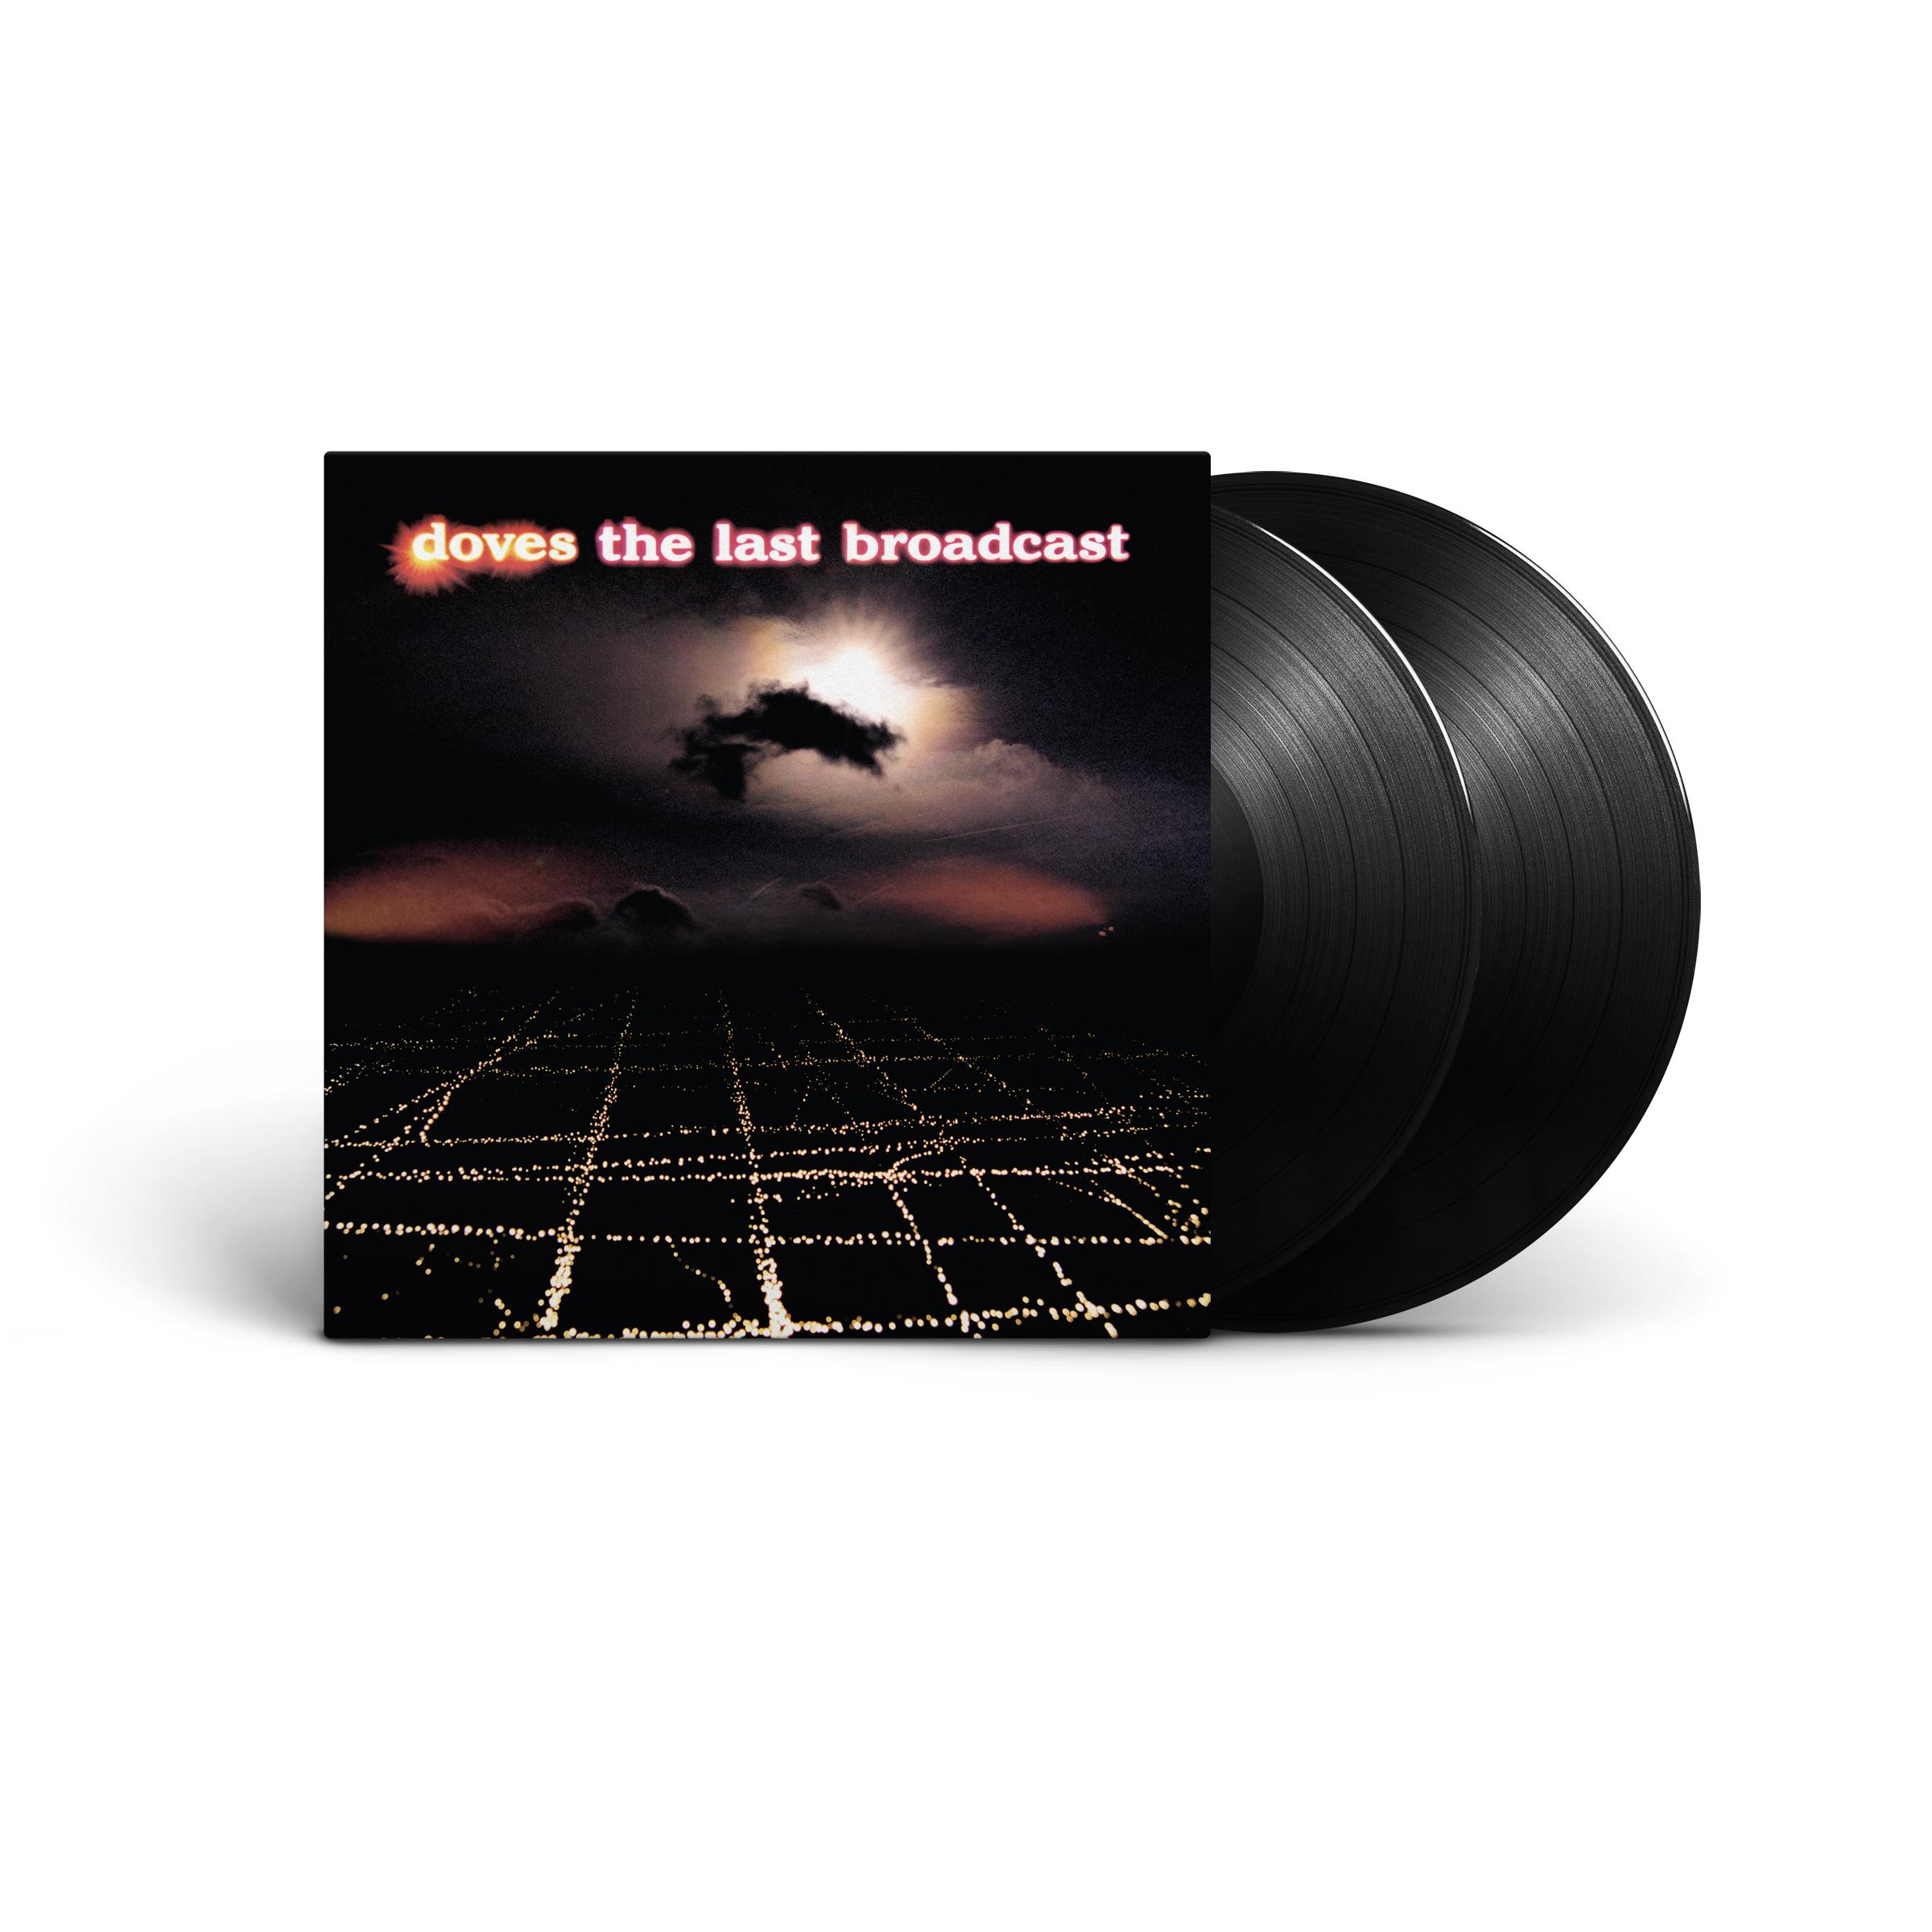 Image for article: Black Vinyl Reissues